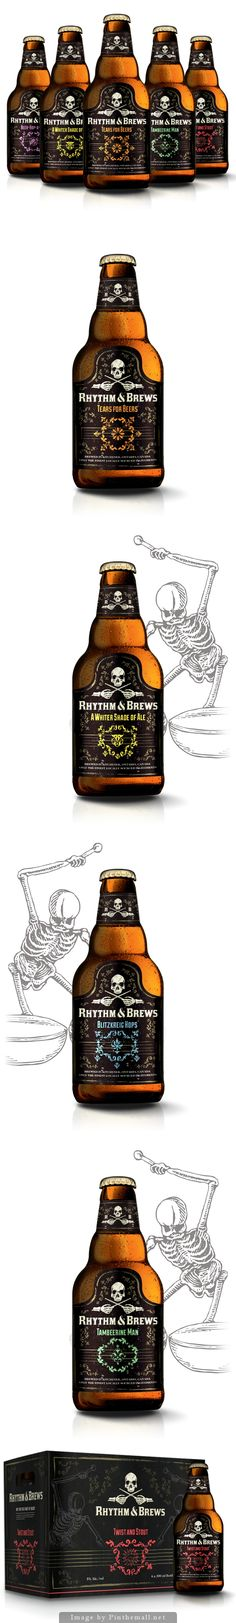 Rhythm & Brews by Tom Ralston